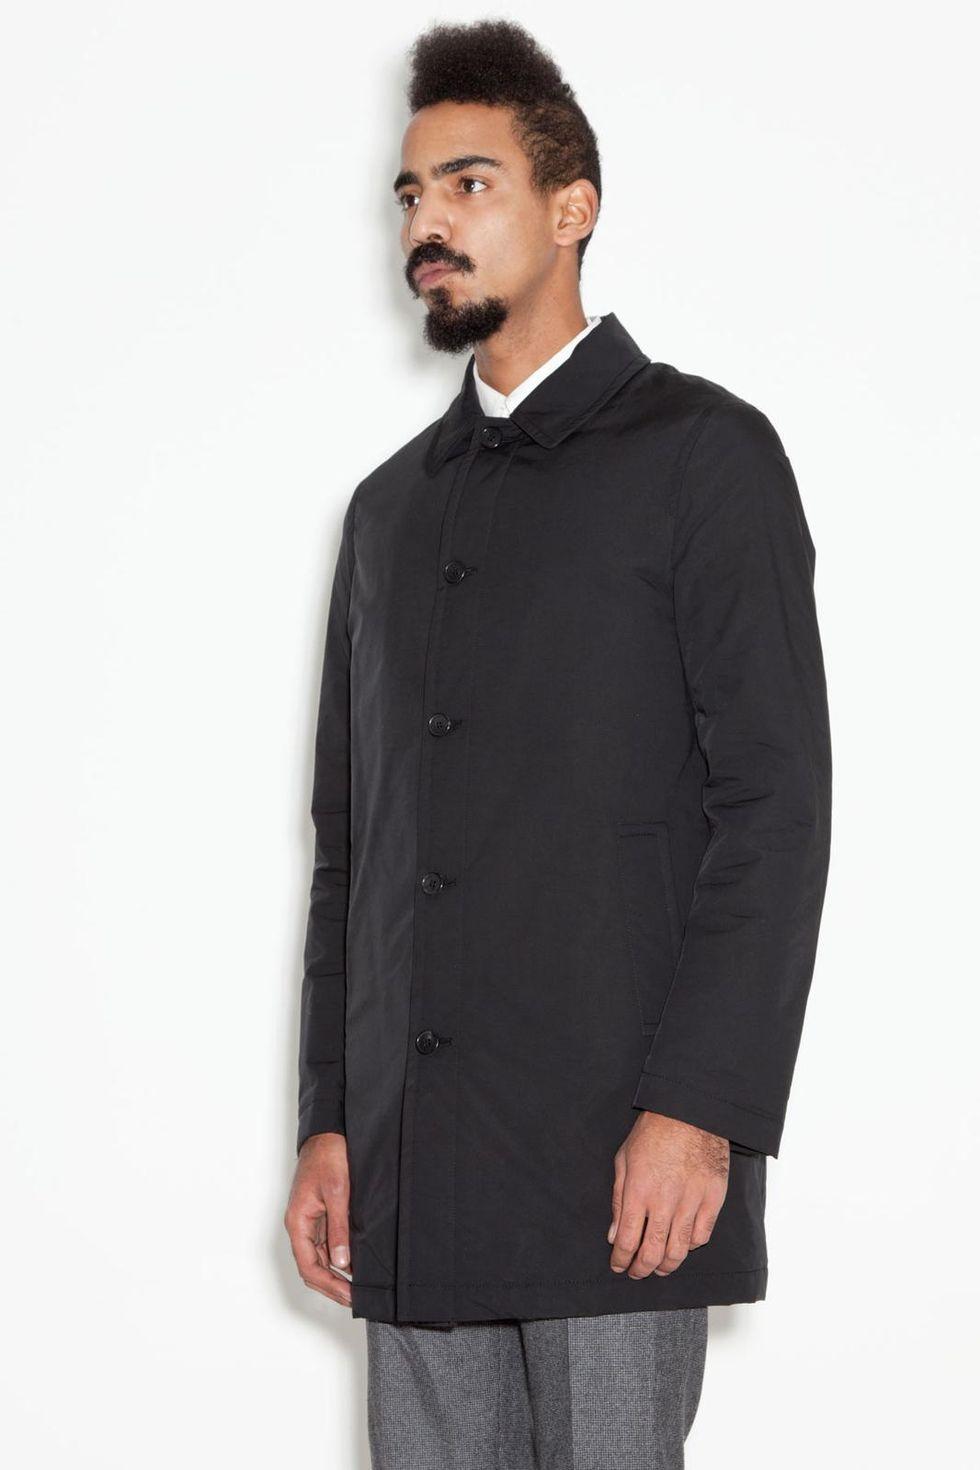 marni-coat-black04.jpg